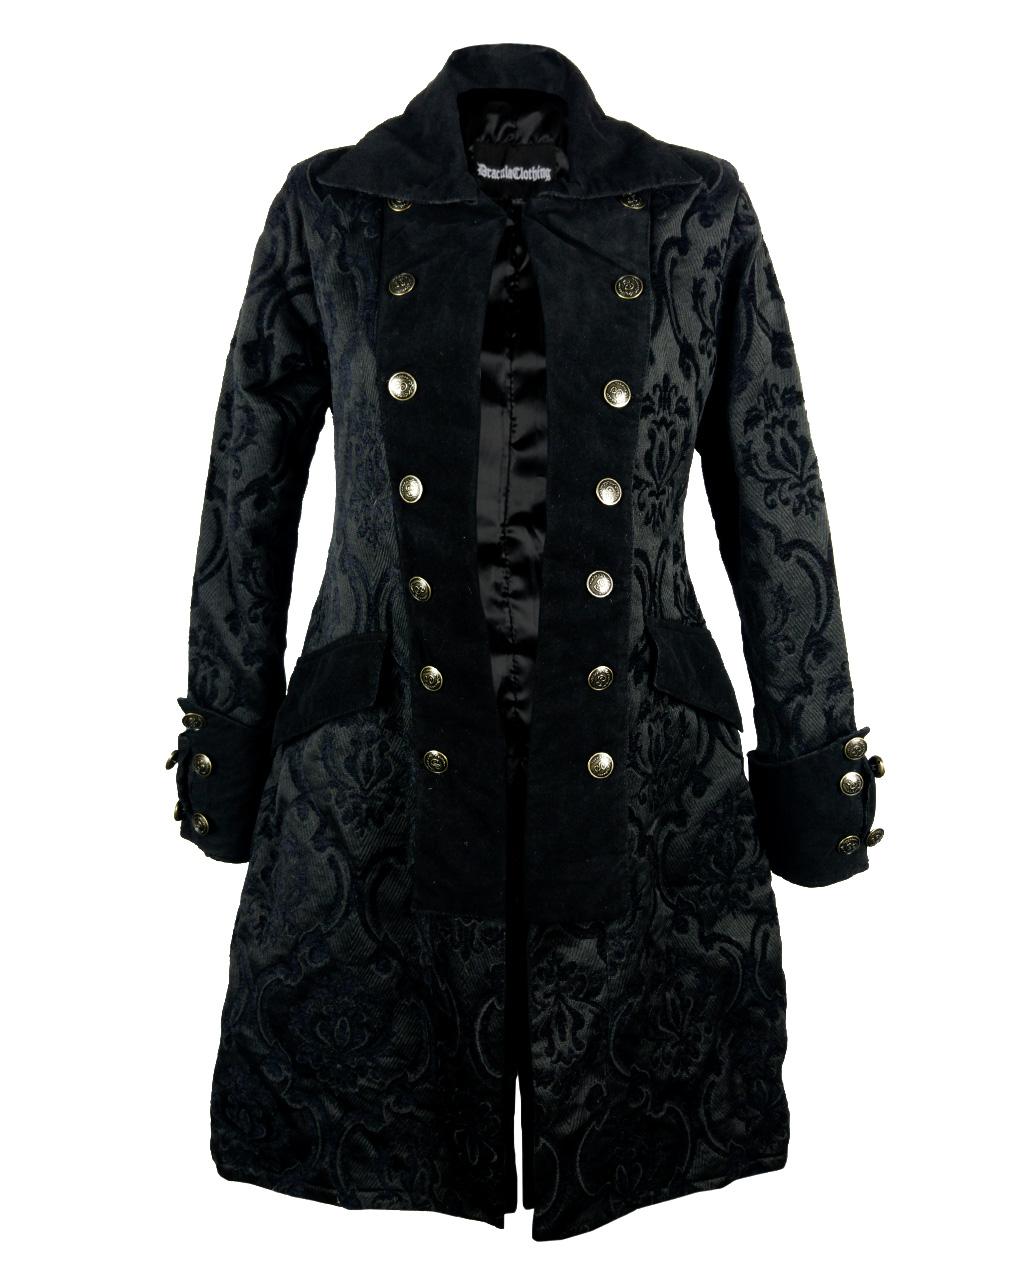 Damen Piratenmantel schwarzer Brokat